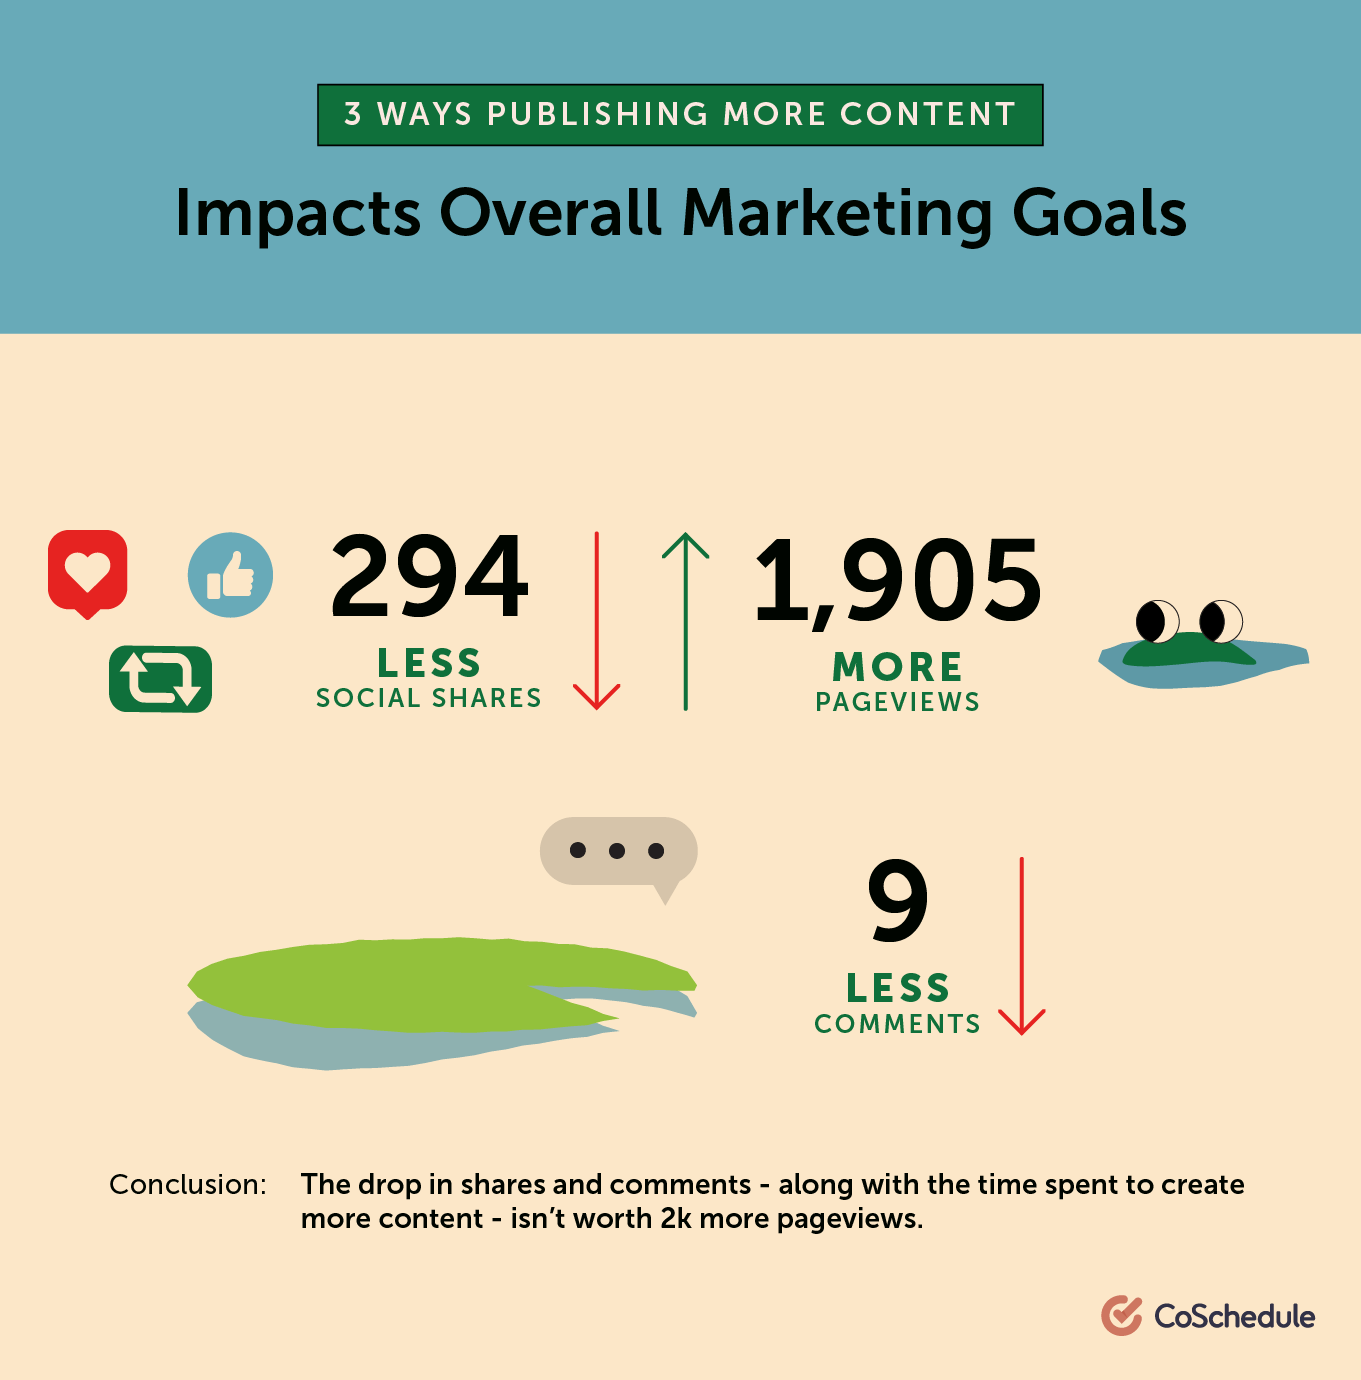 Publishing more content impacts marketing goals